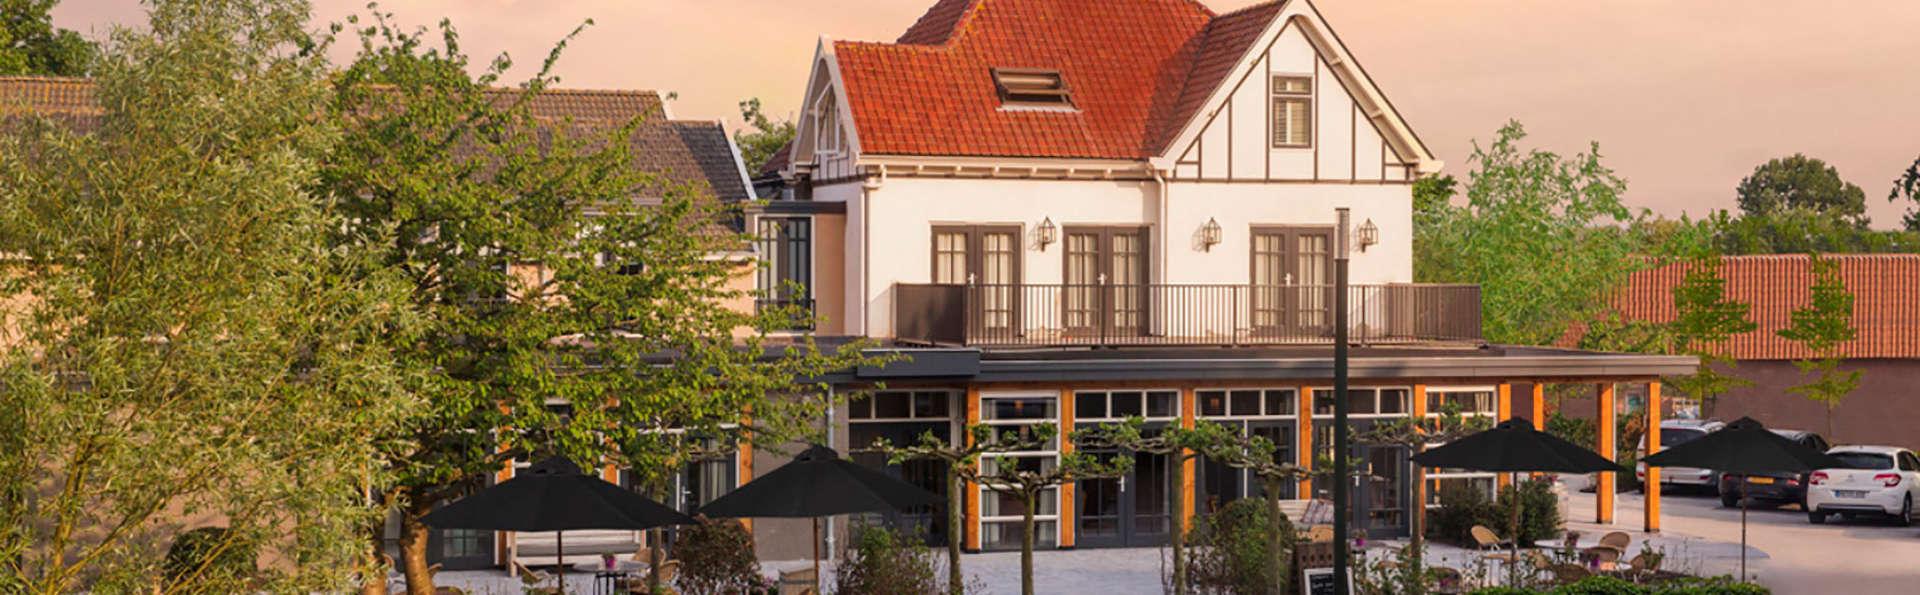 Badhotel Renesse - EDIT_front1.jpg